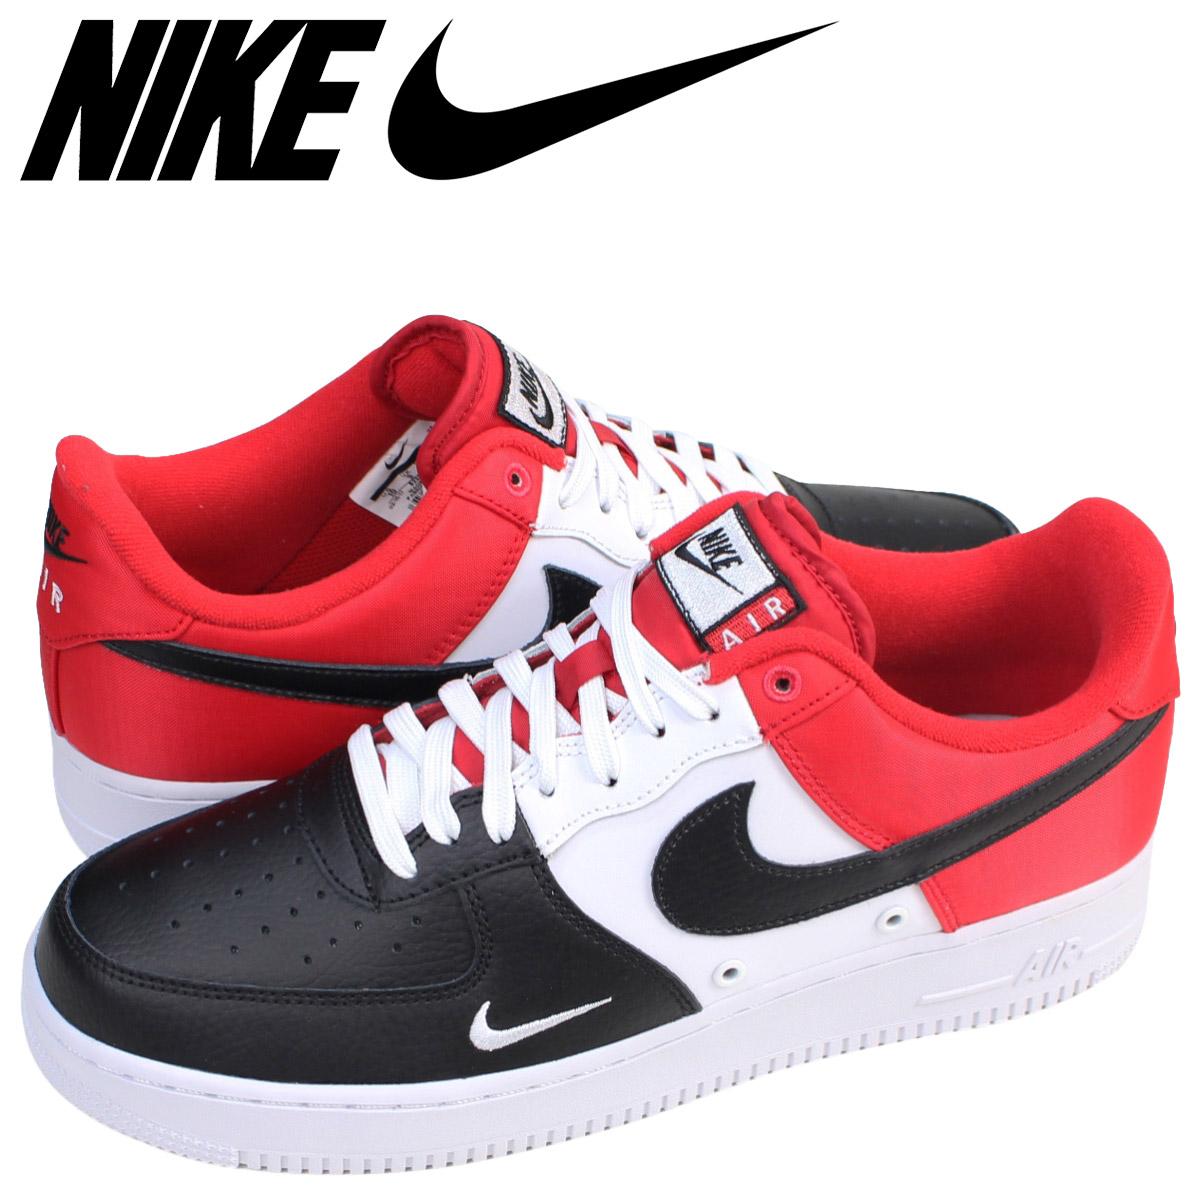 7c52fef81ff ALLSPORTS  NIKE Nike air force 1 sneakers AIR FORCE 1 07 LV8 BLACK ...